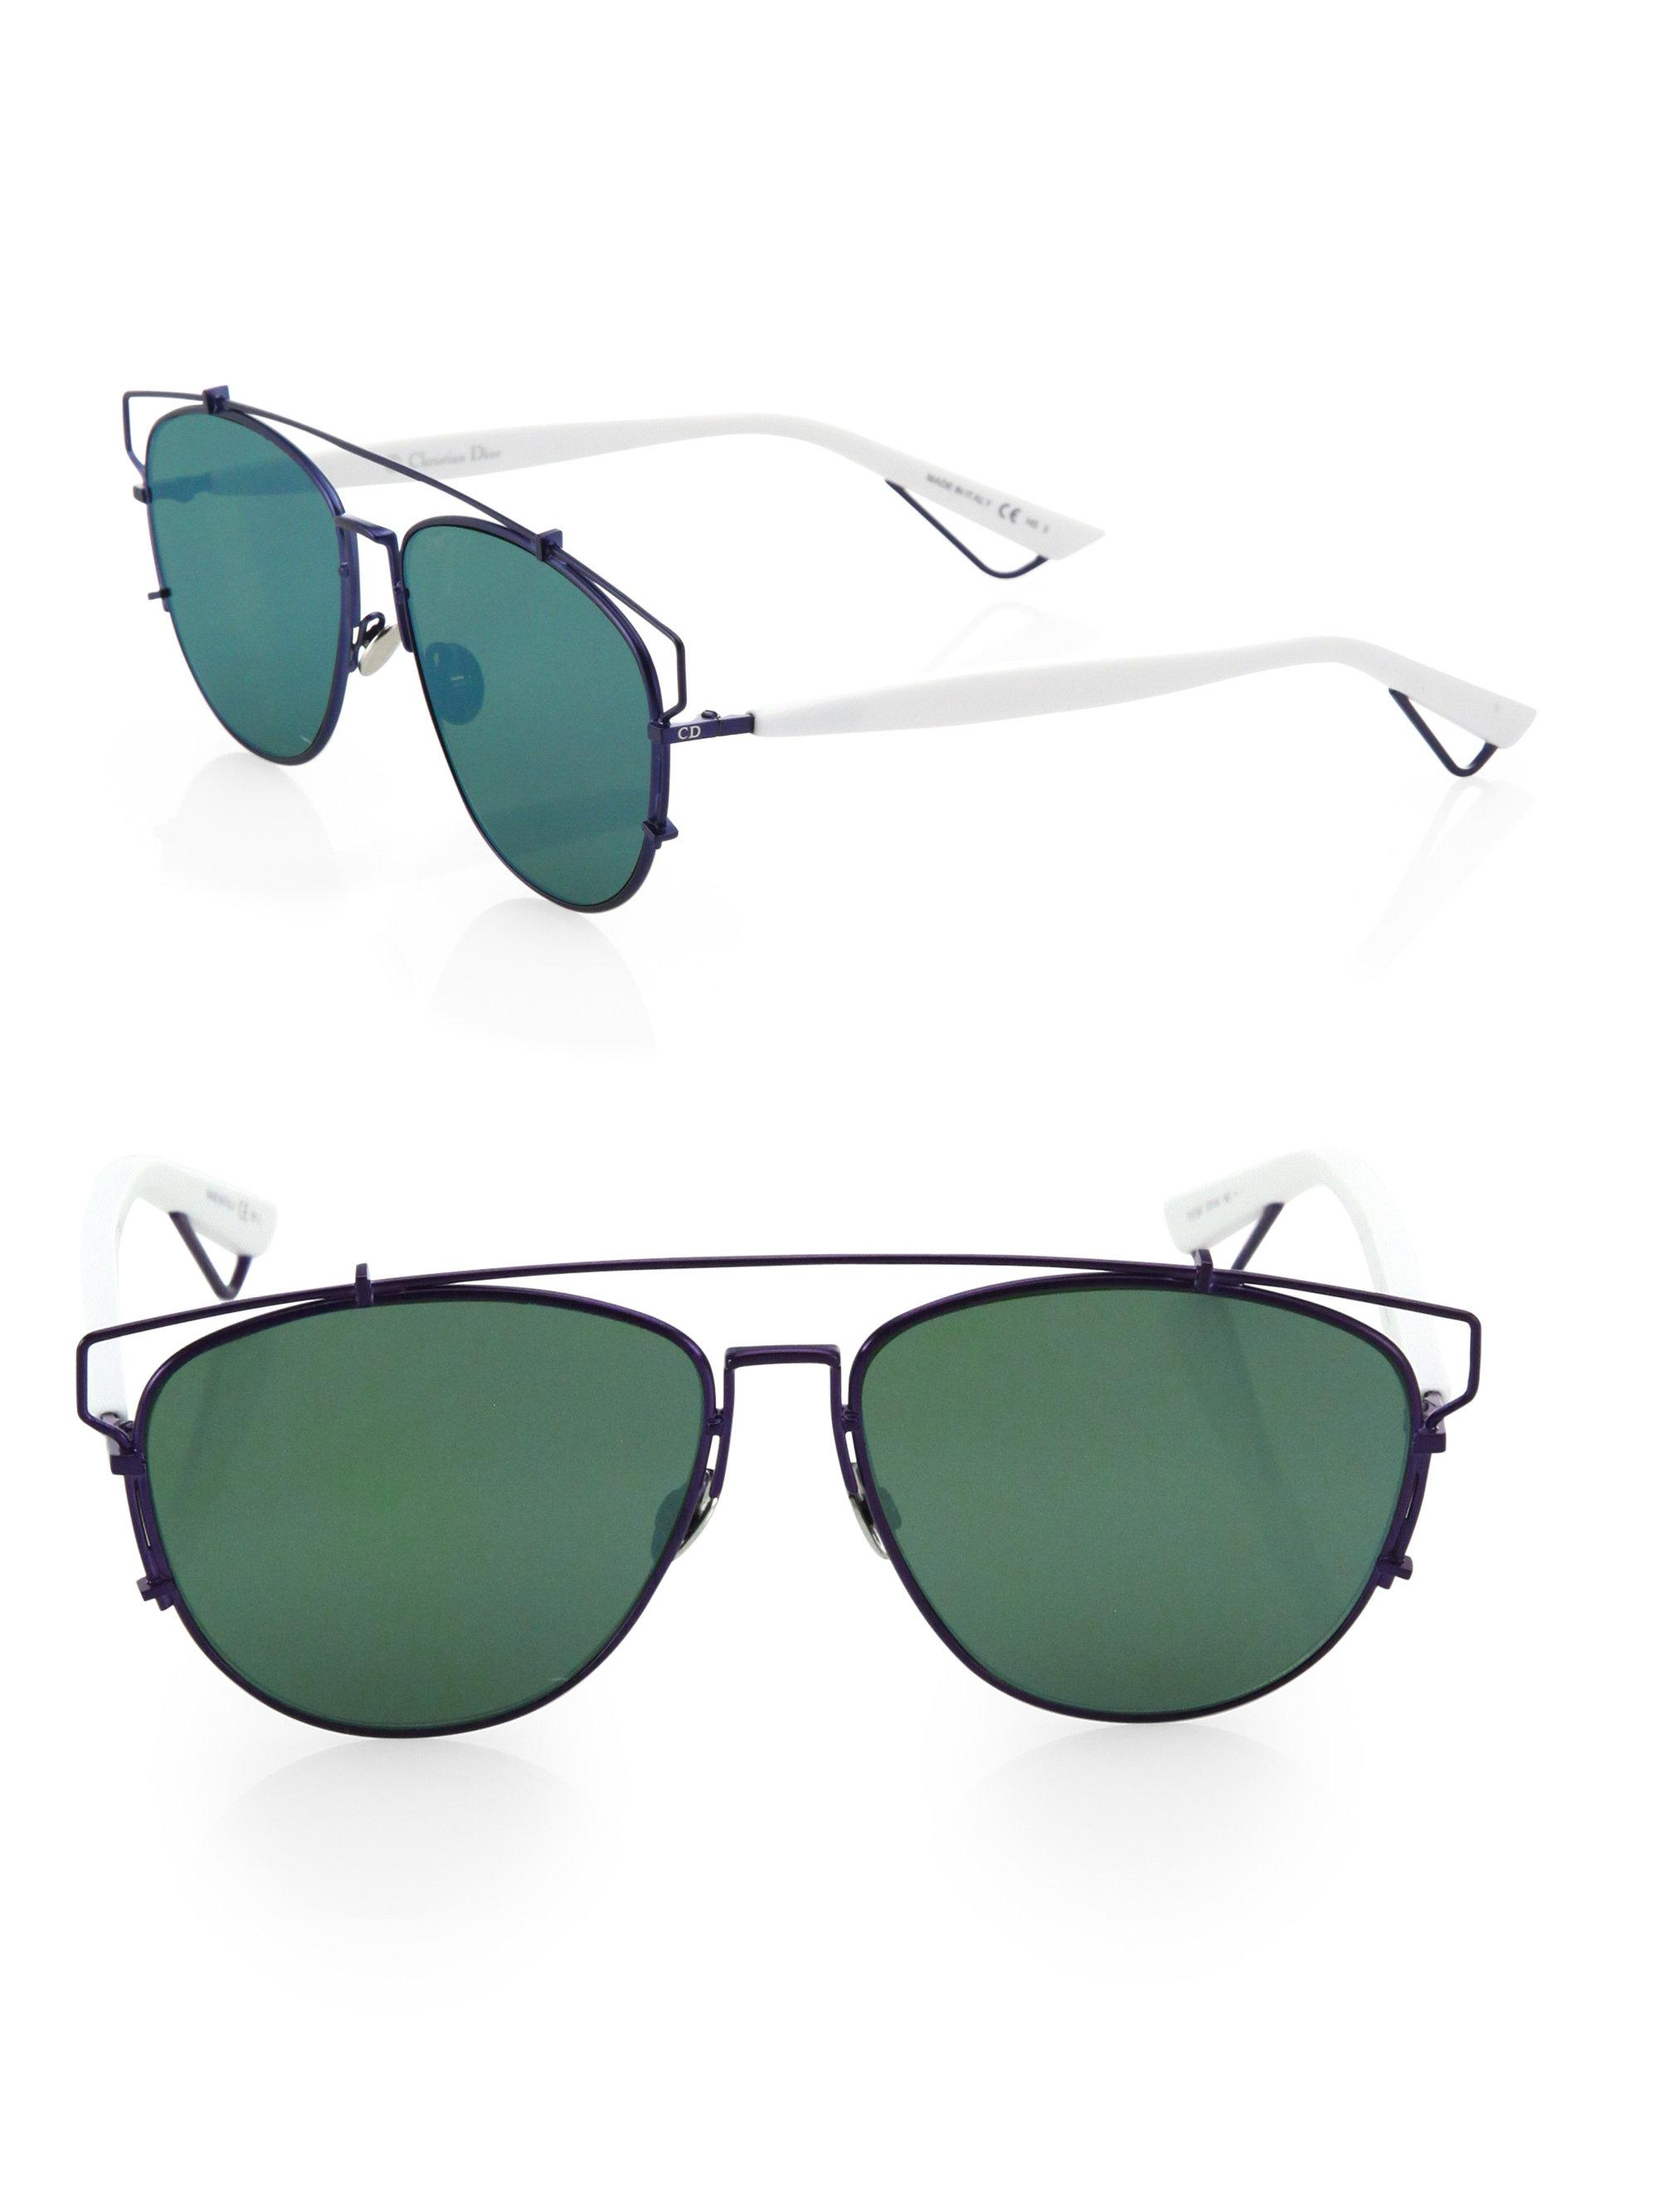 af79a89823d Lyst - Dior Women s Technologic 57mm Pantos Sunglasses - Dark Blue ...